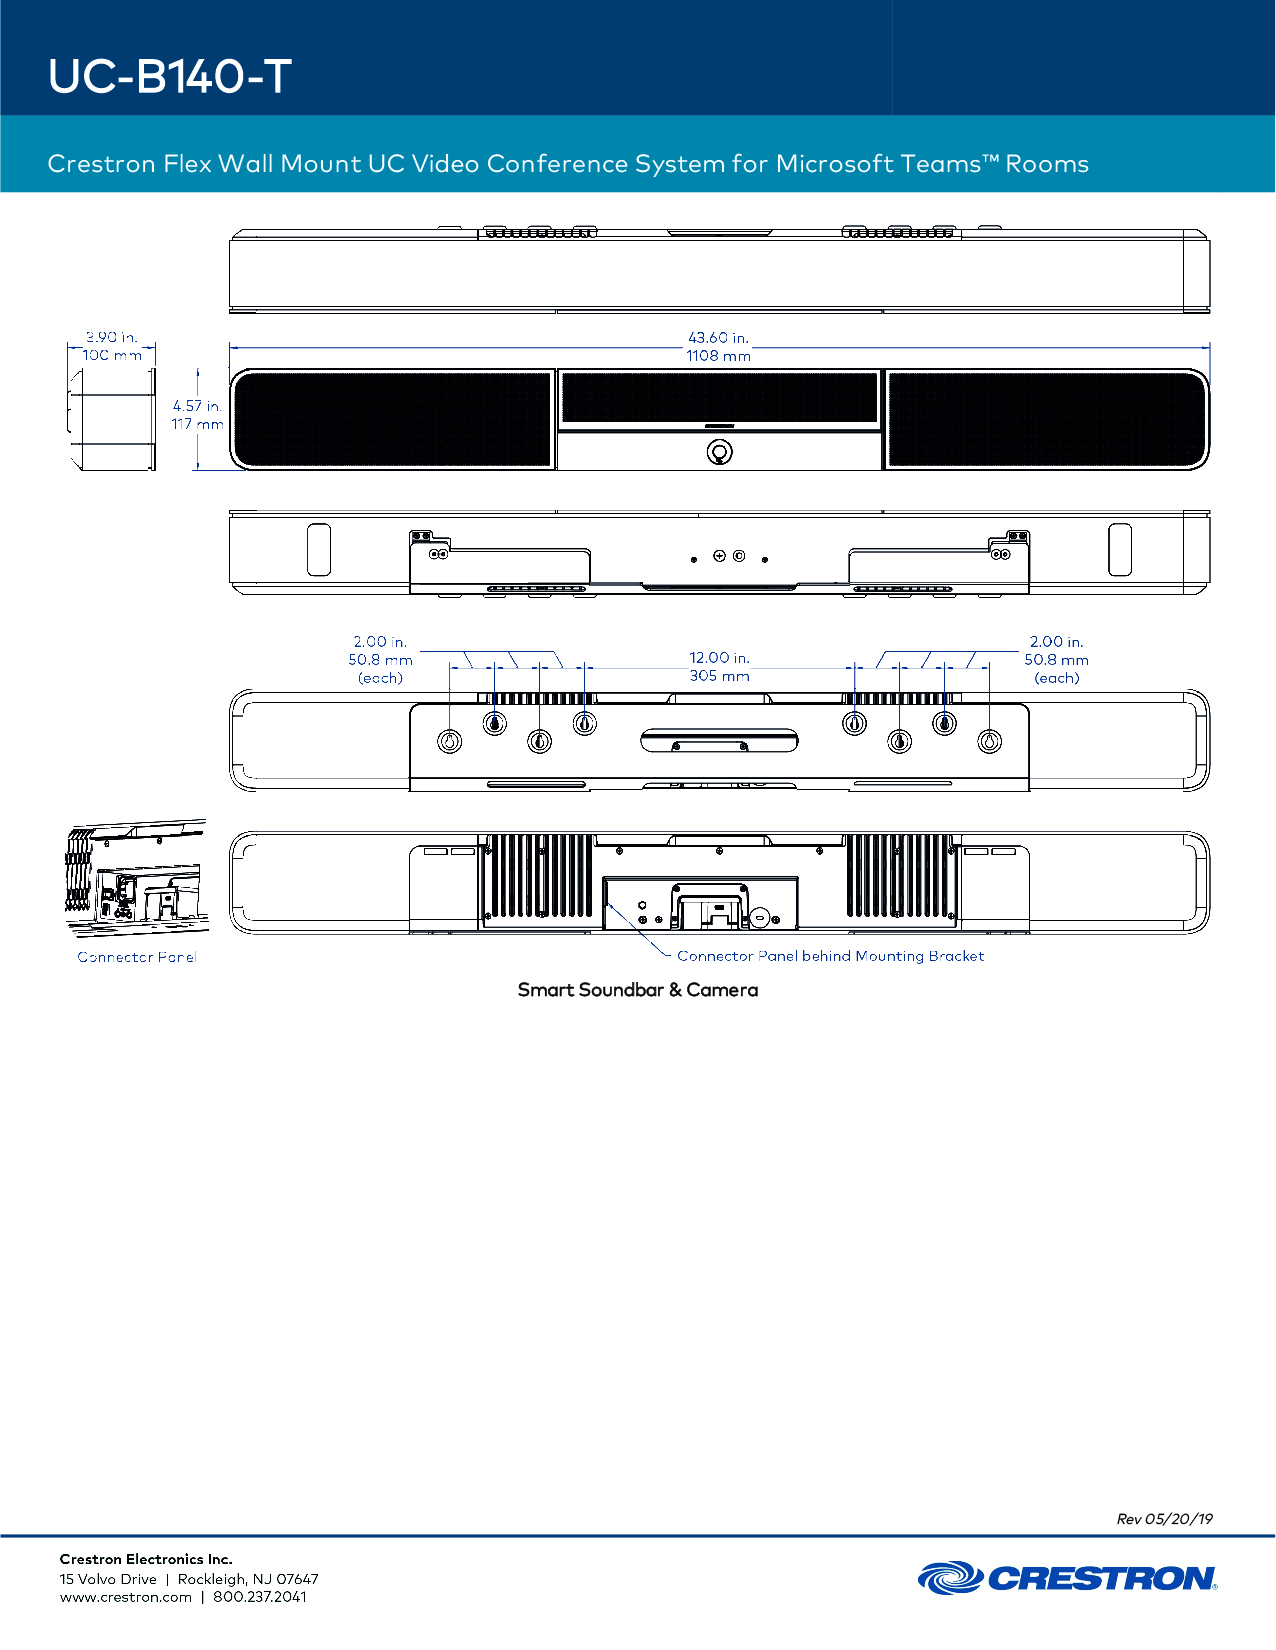 Crestron Flex UC-B140-T